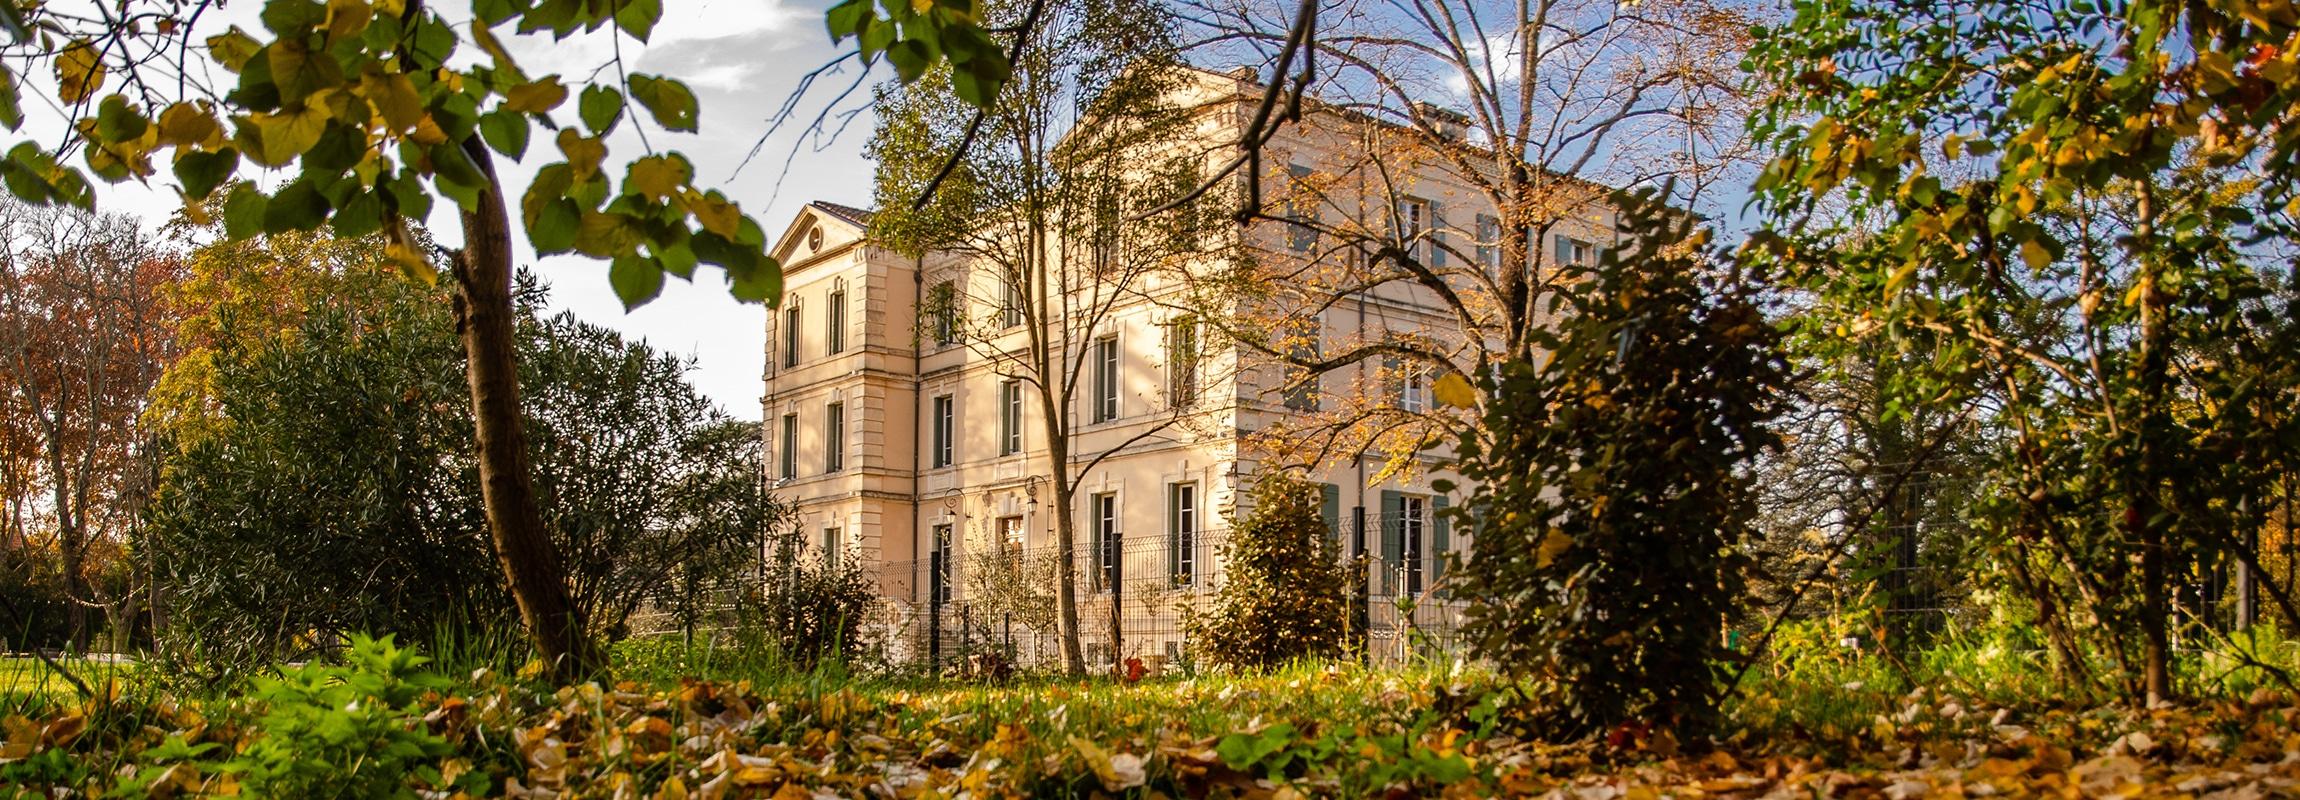 Hotel Chateau de Montcaud in der Provence